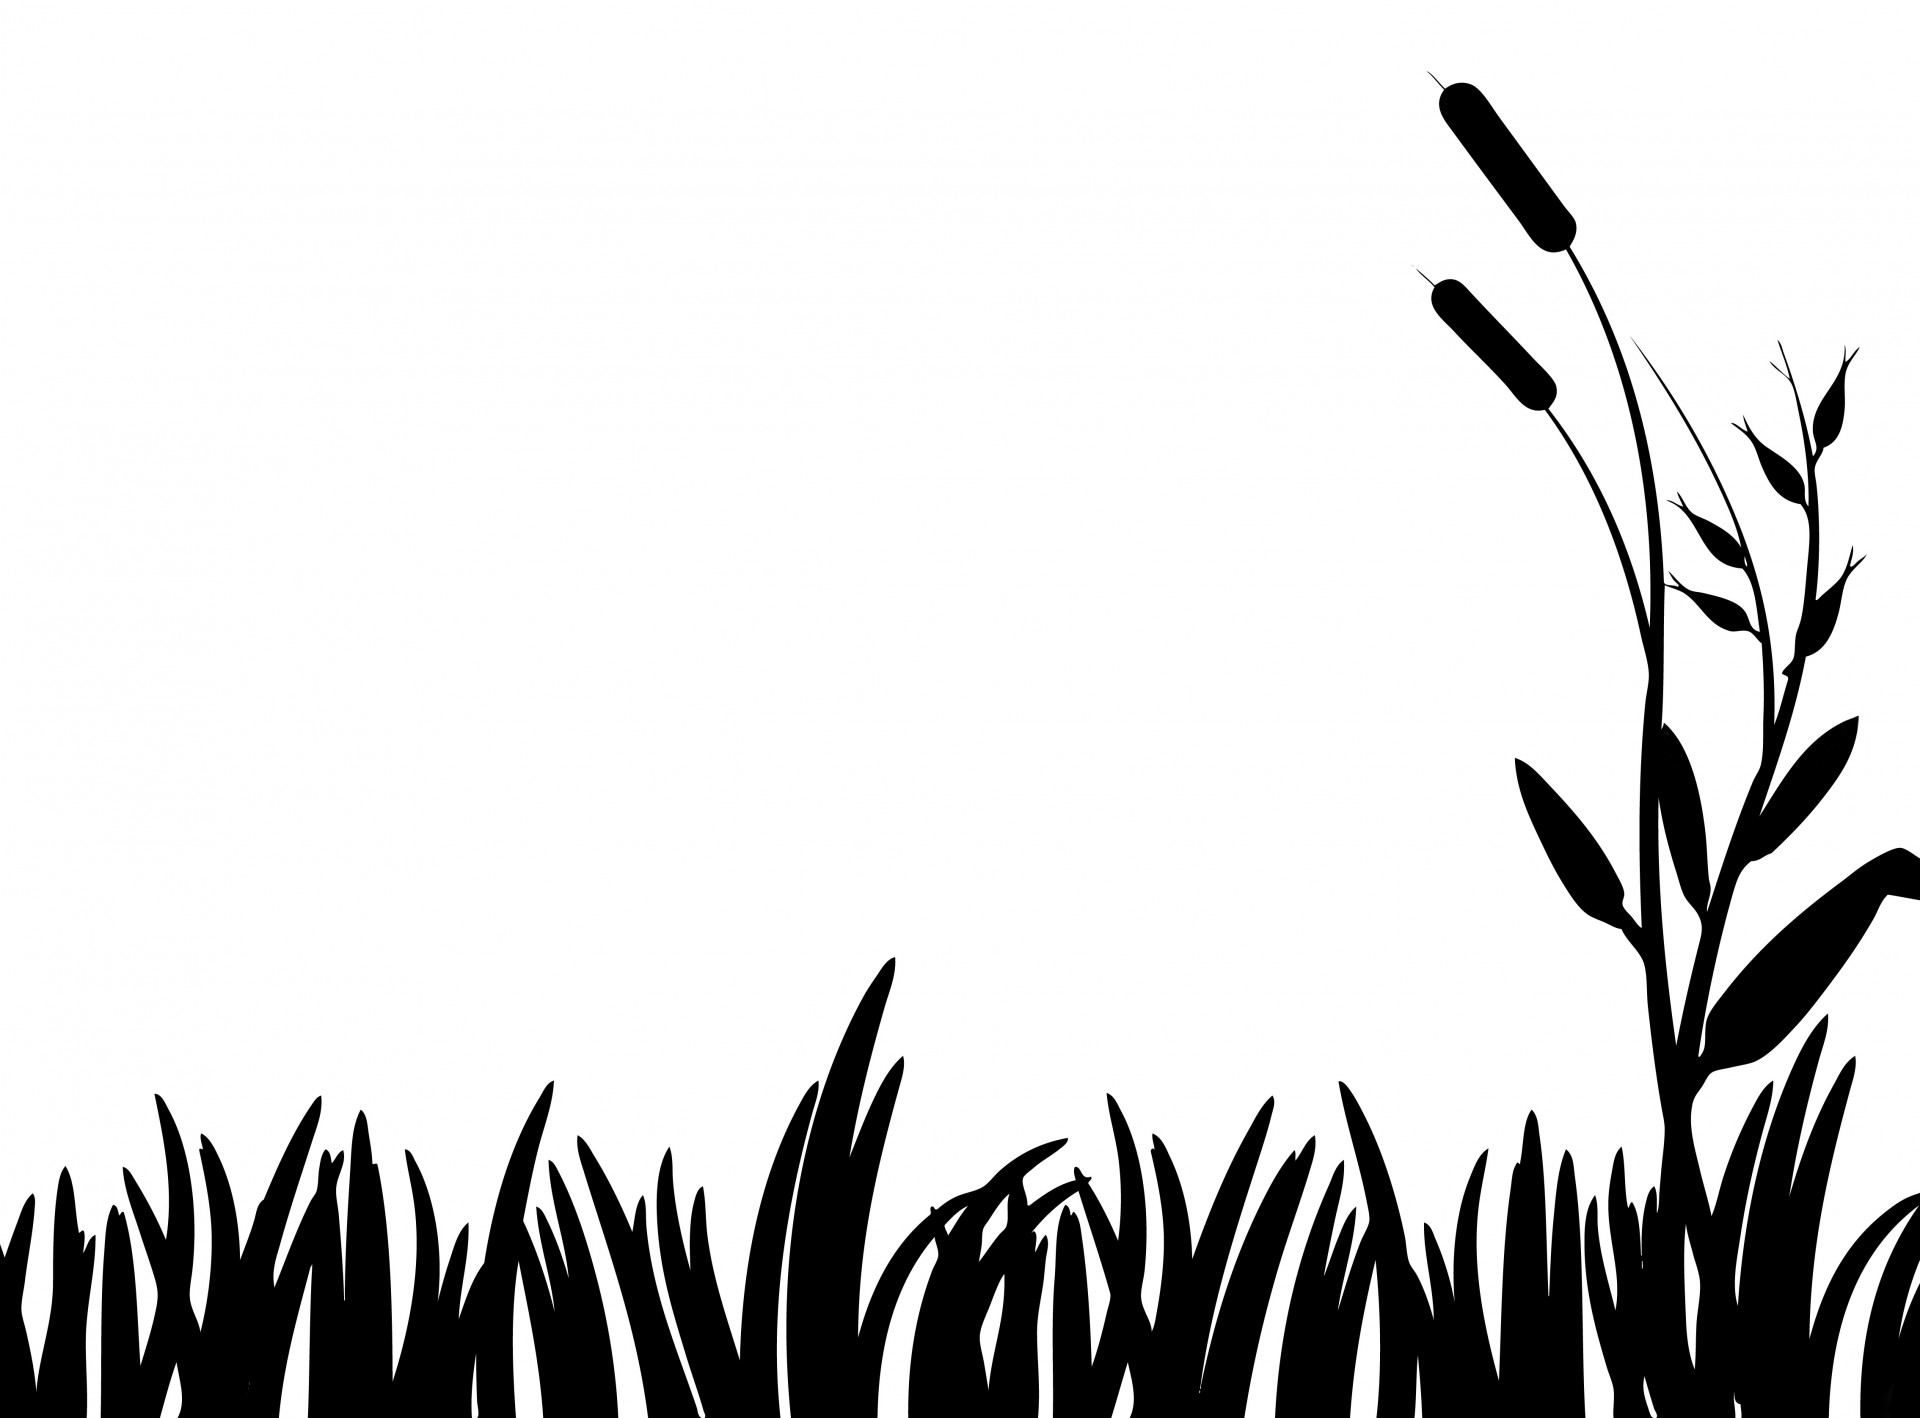 Grass Clipart Free